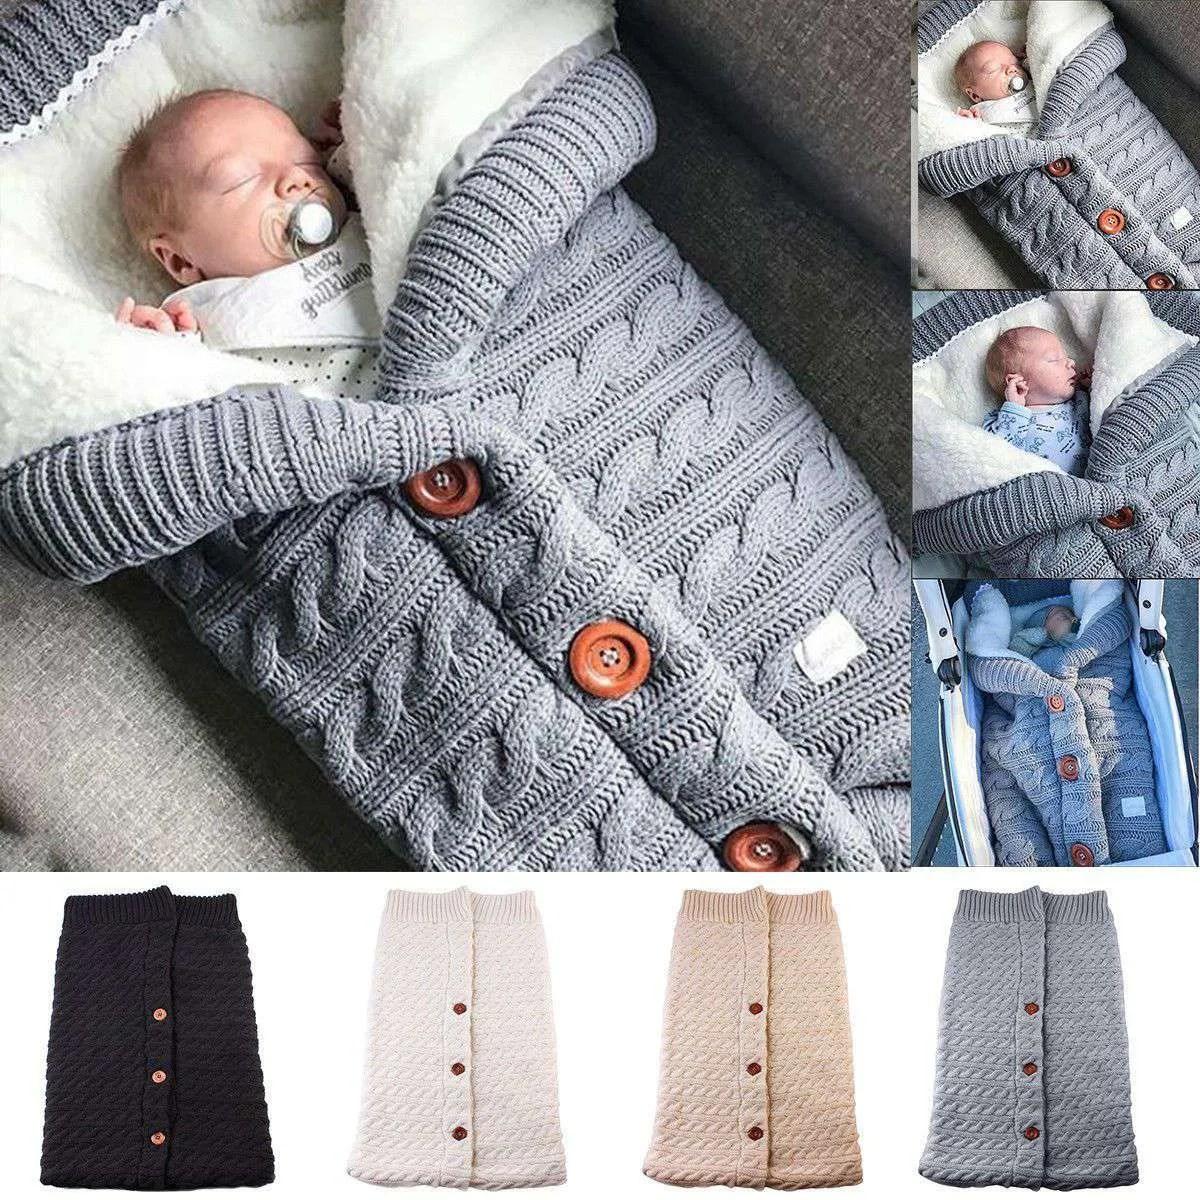 Newborn Baby Winter Warm Sleeping Bags